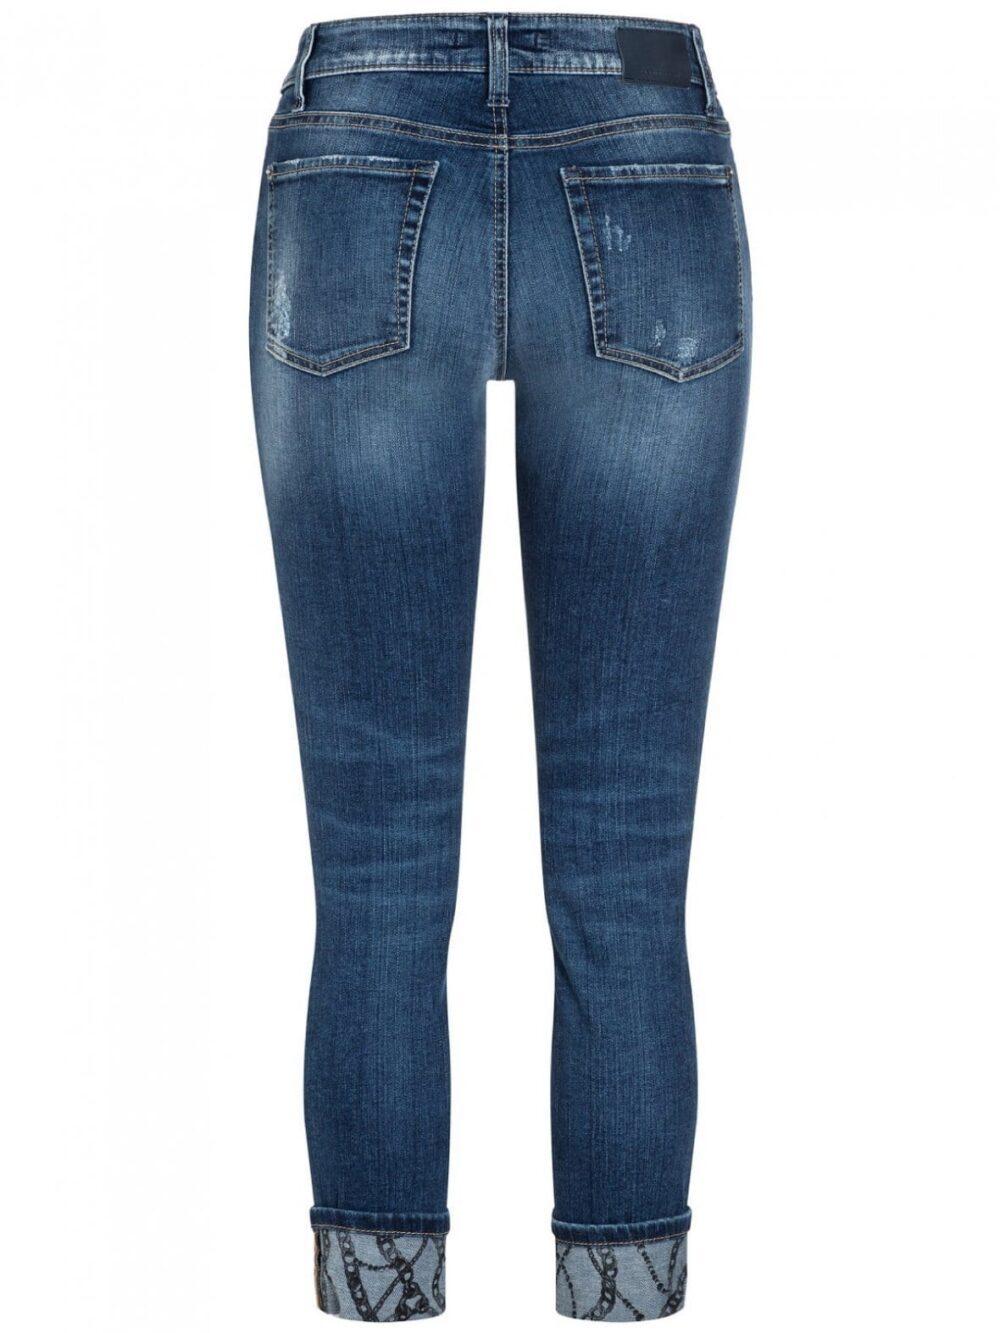 Cambio Pina Jeans 0020 12 9128 5176 2